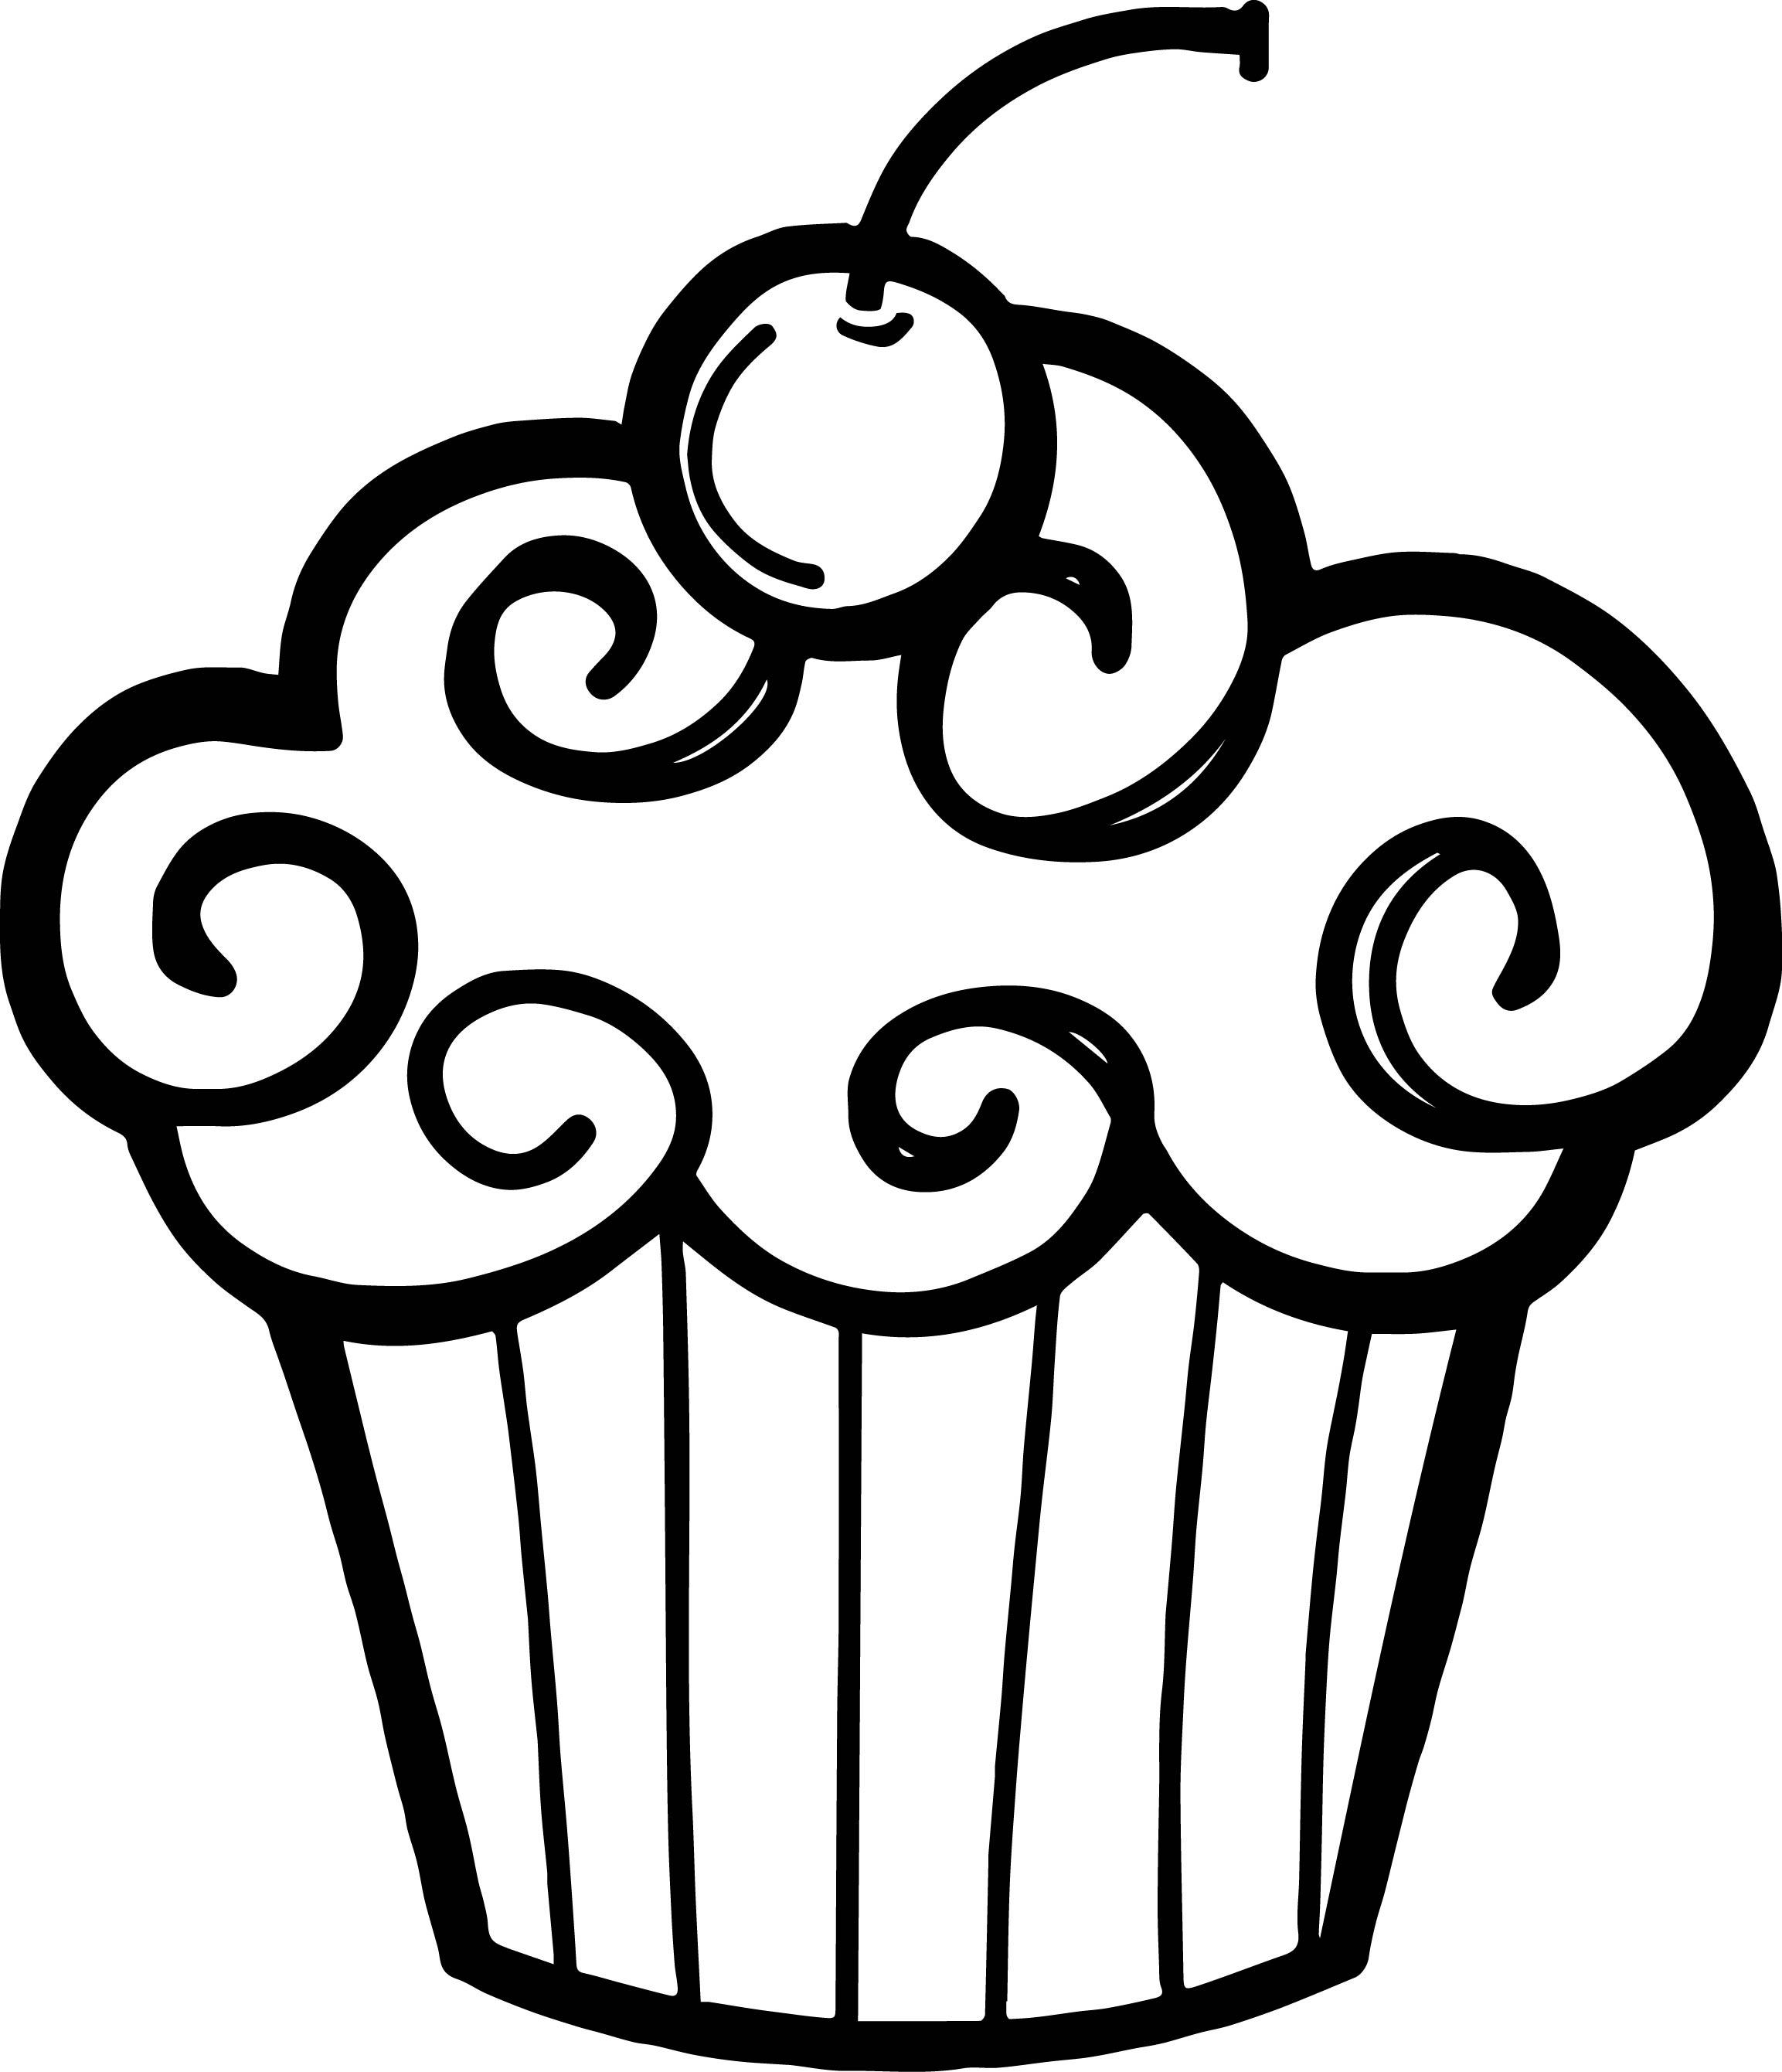 cupcake outline clip art clipart best bake sale clip art images free bake sale clipart with cakes